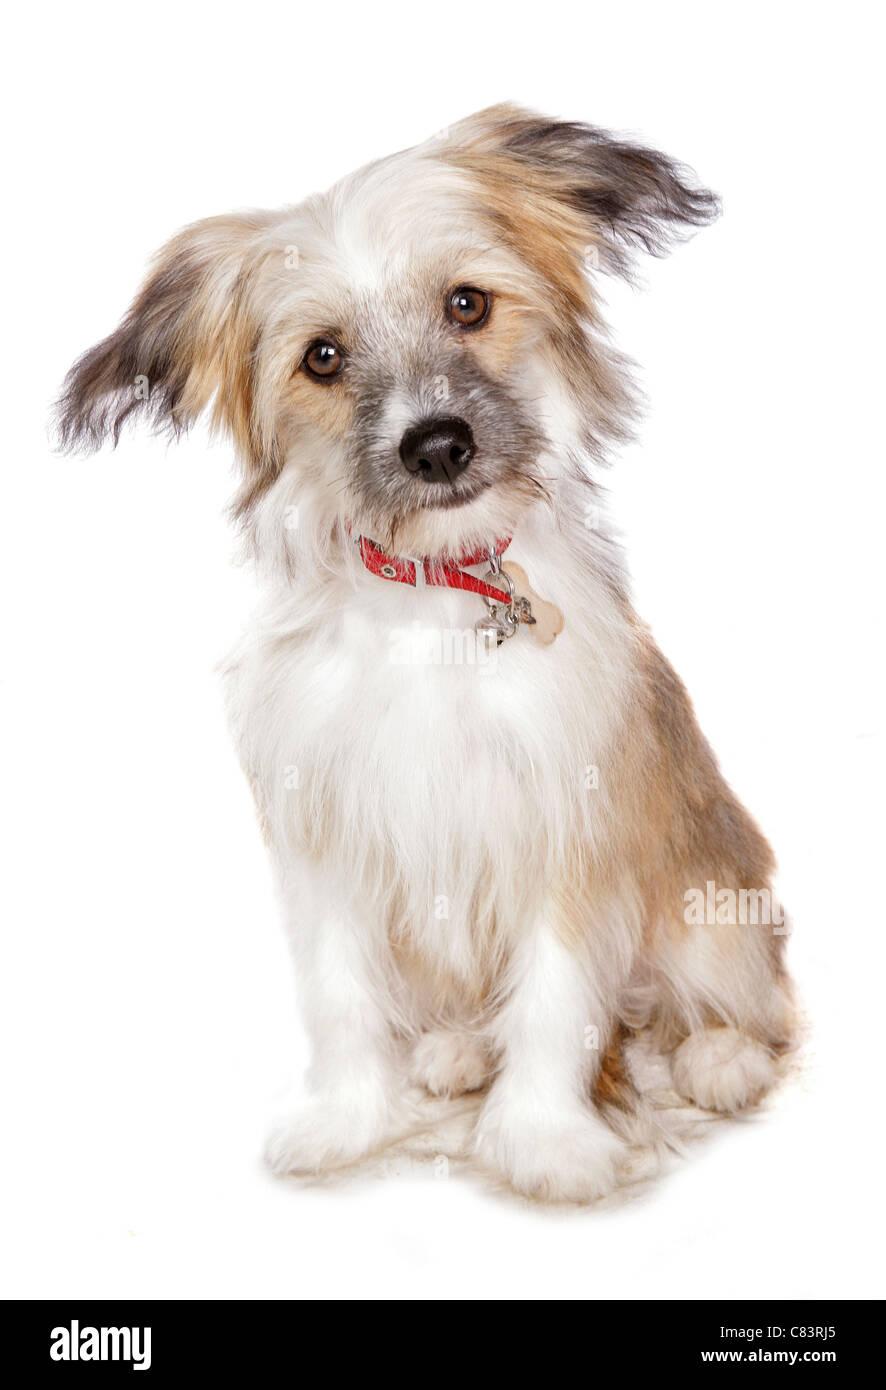 Chinese Crested dog (Powder Puff) - puppy - sitting - Stock Image